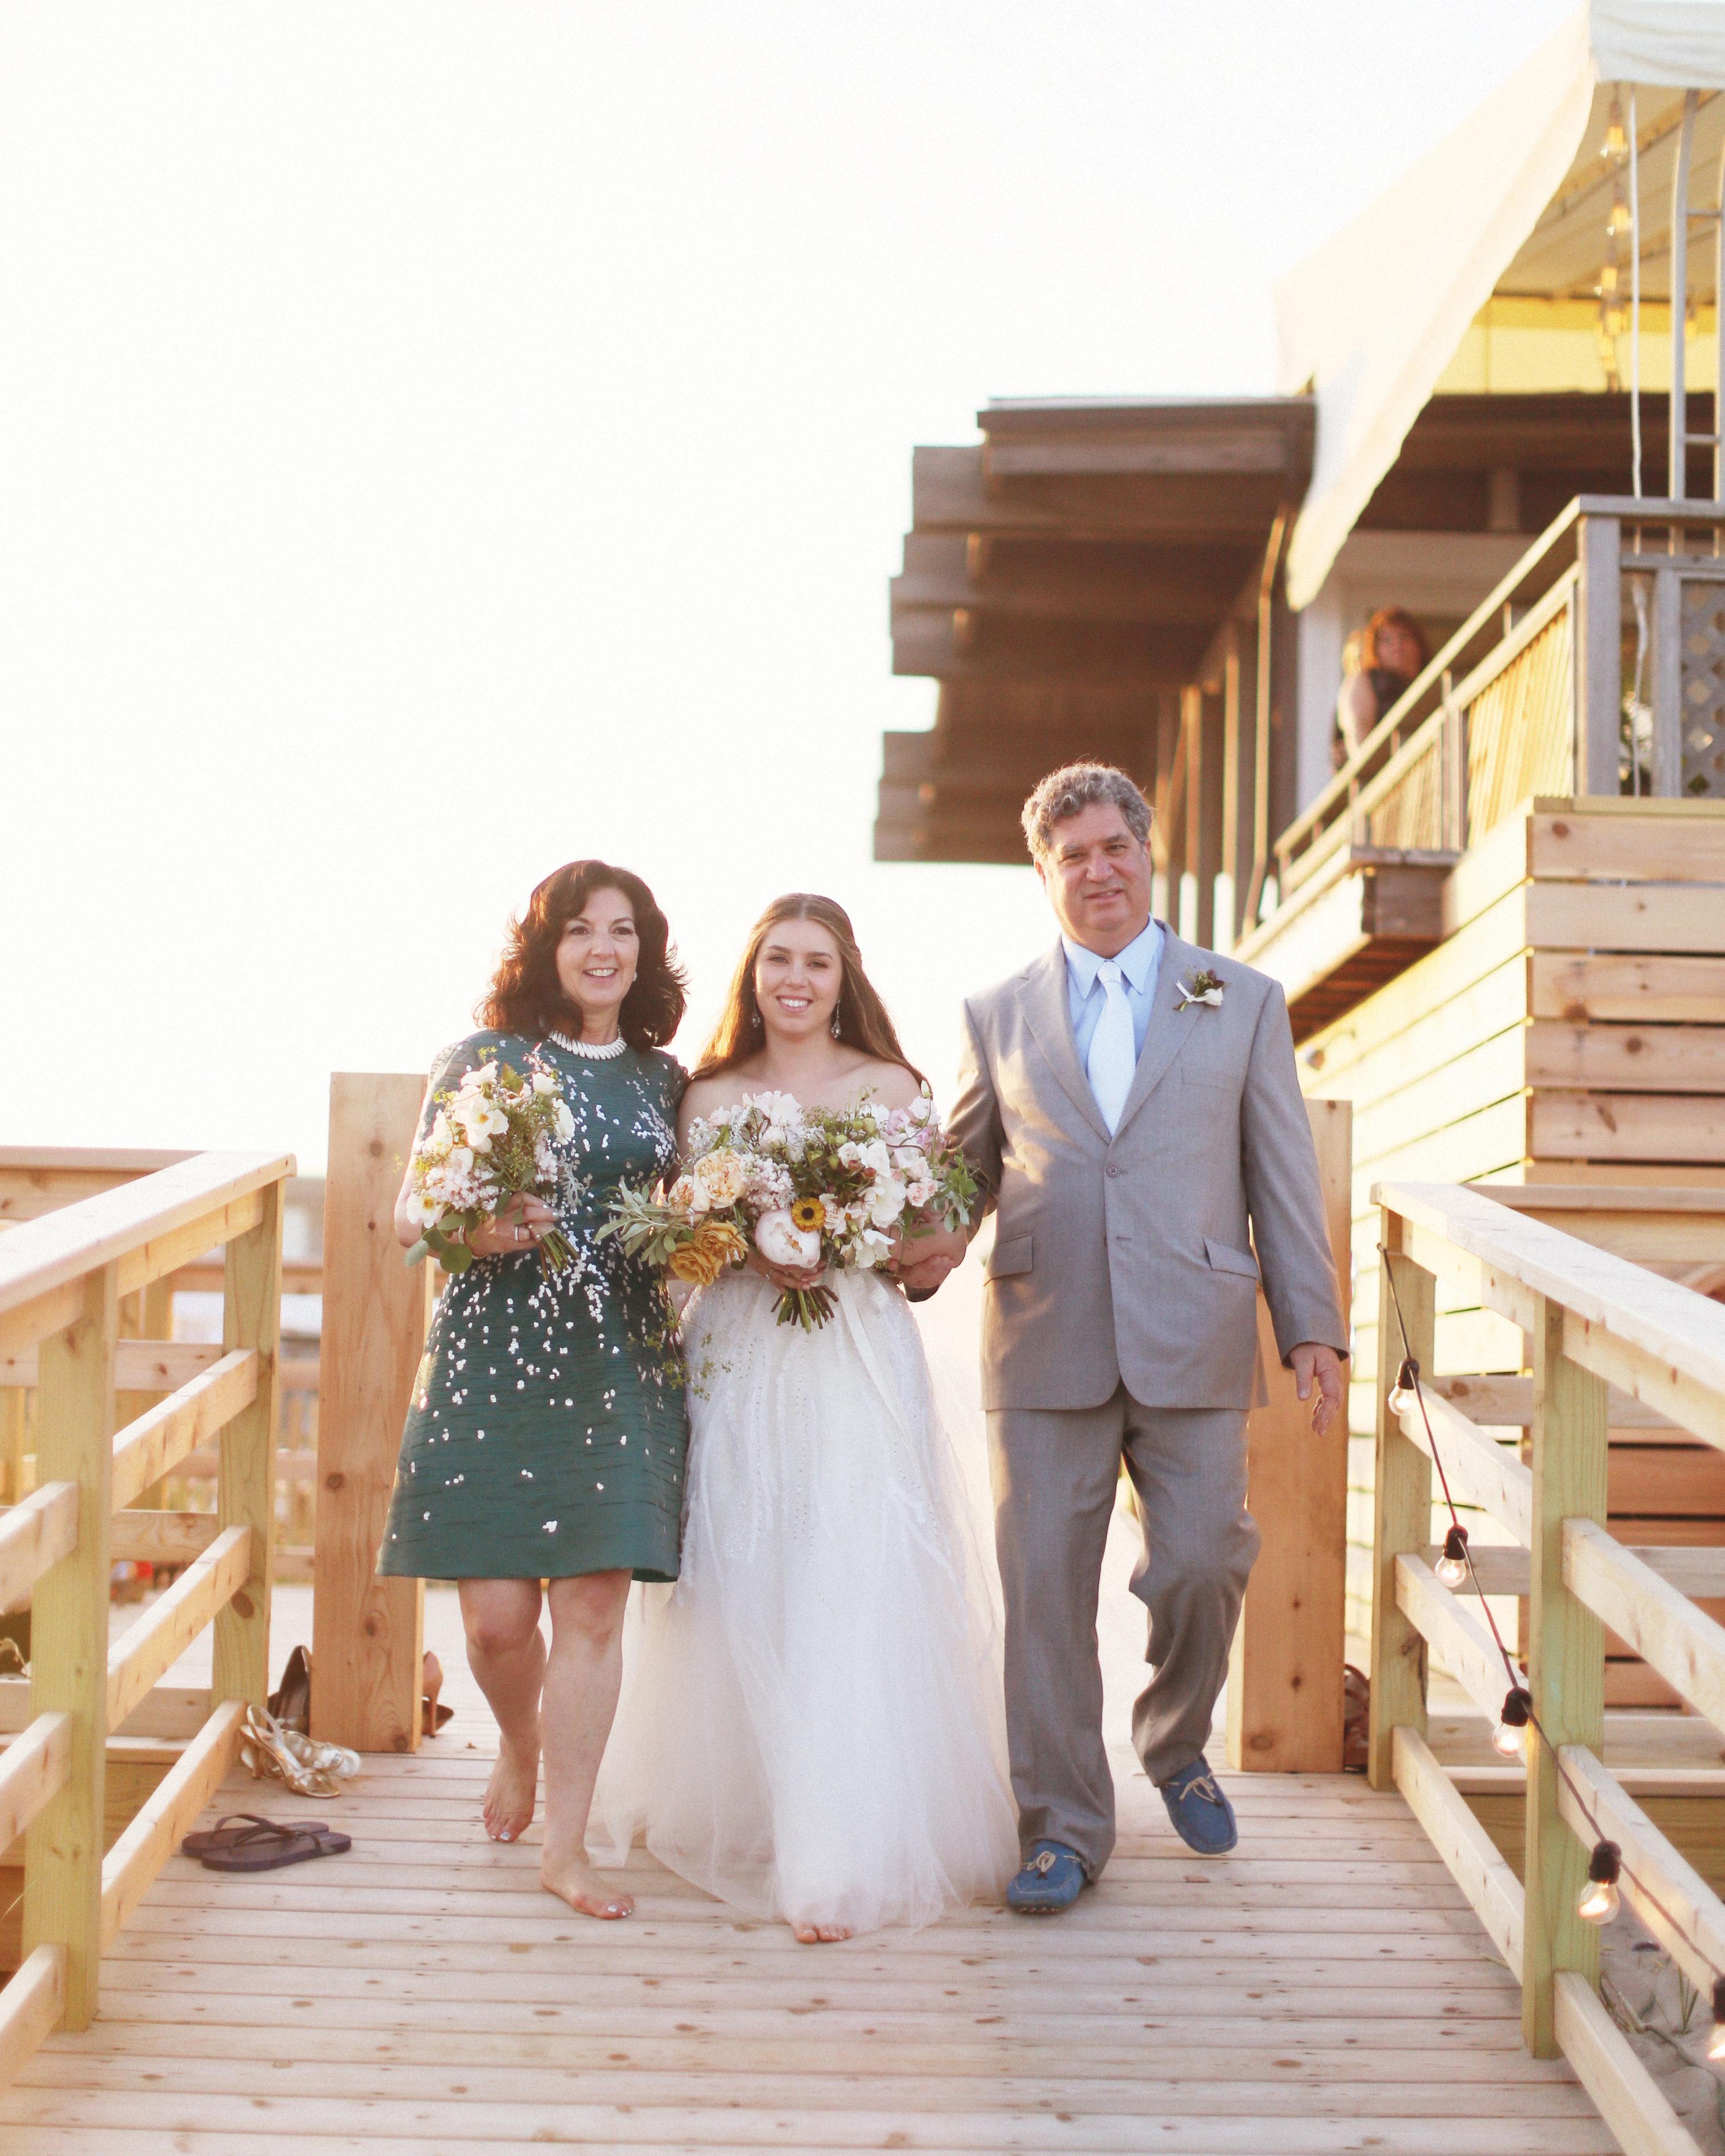 sarah-evan-wedding-entrance1-0514.jpg